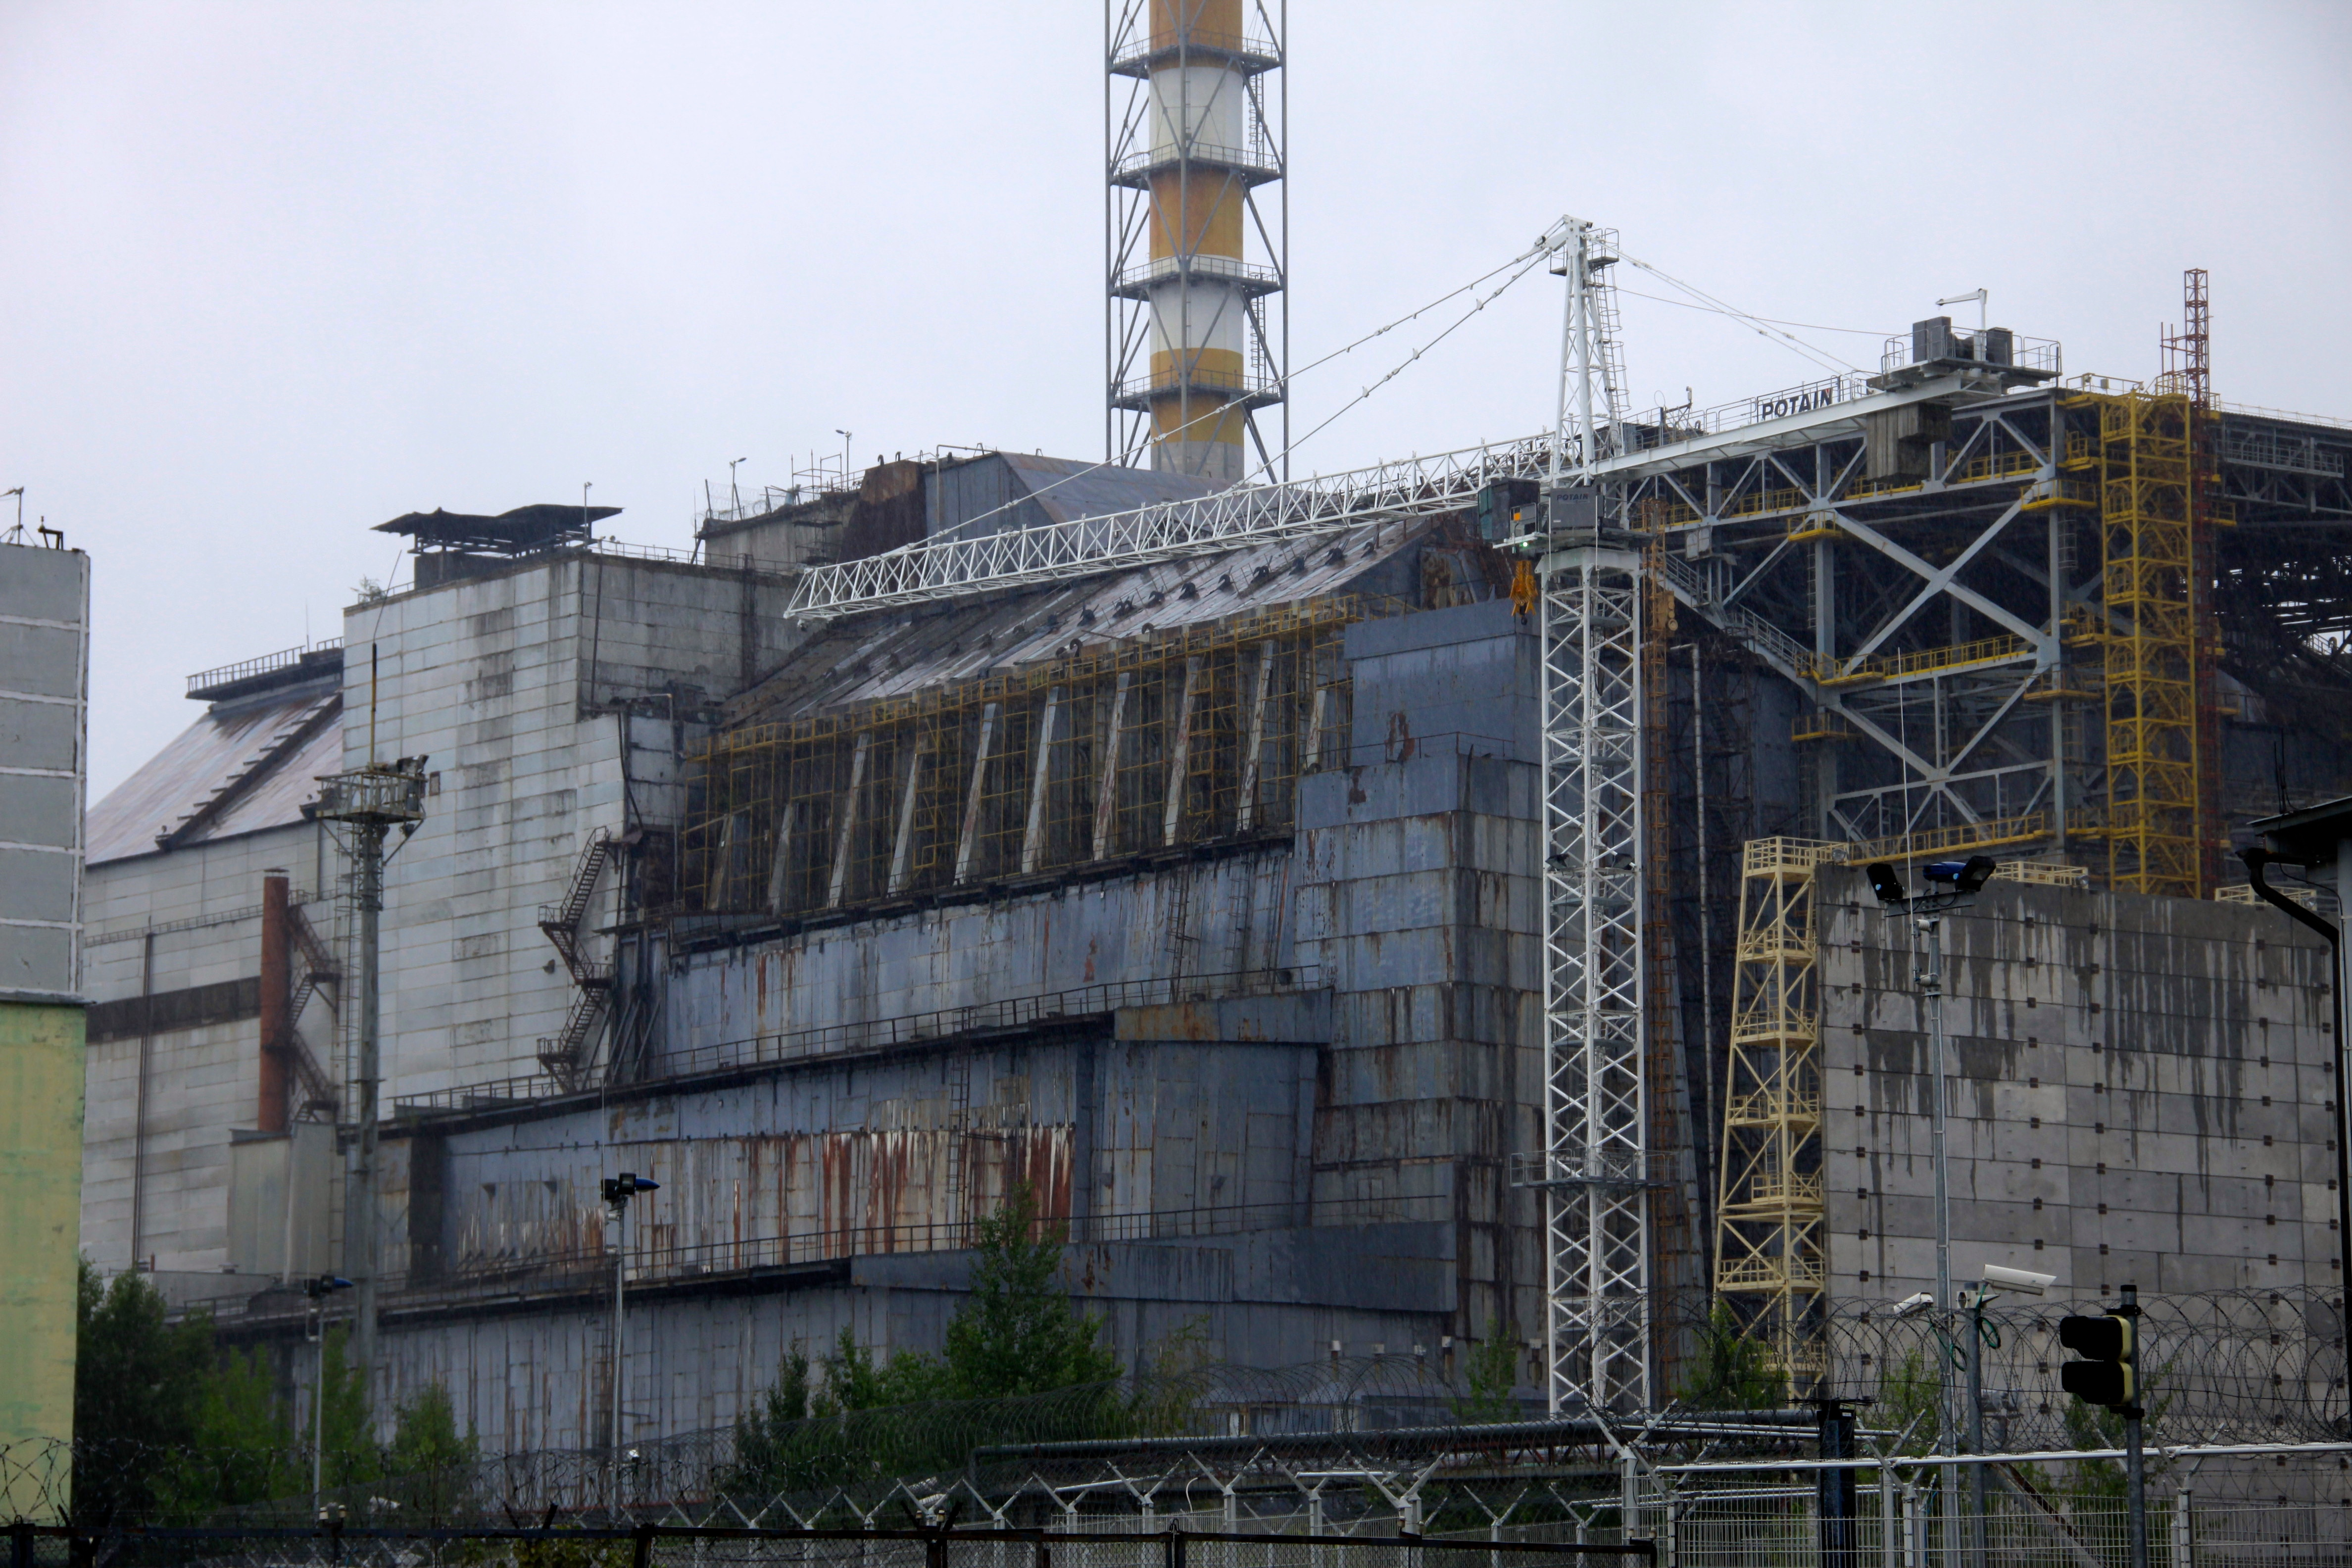 Destroy the Reactor